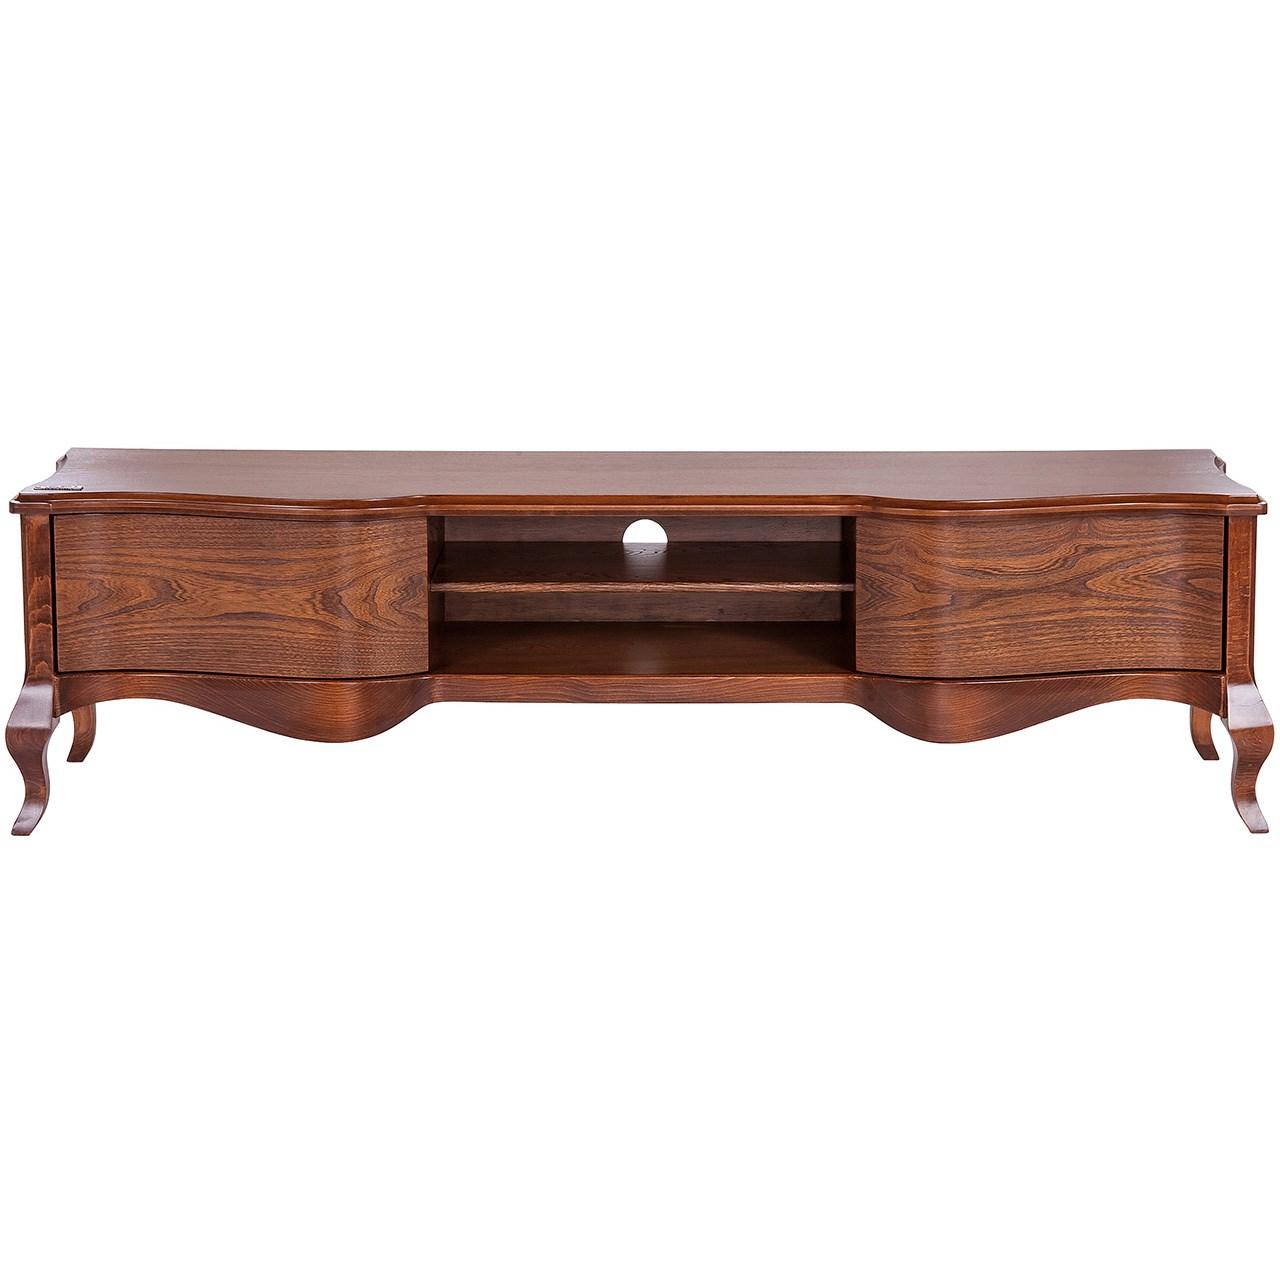 میز تلویزیون آیلکس مدل LIONA-WALNUT-160